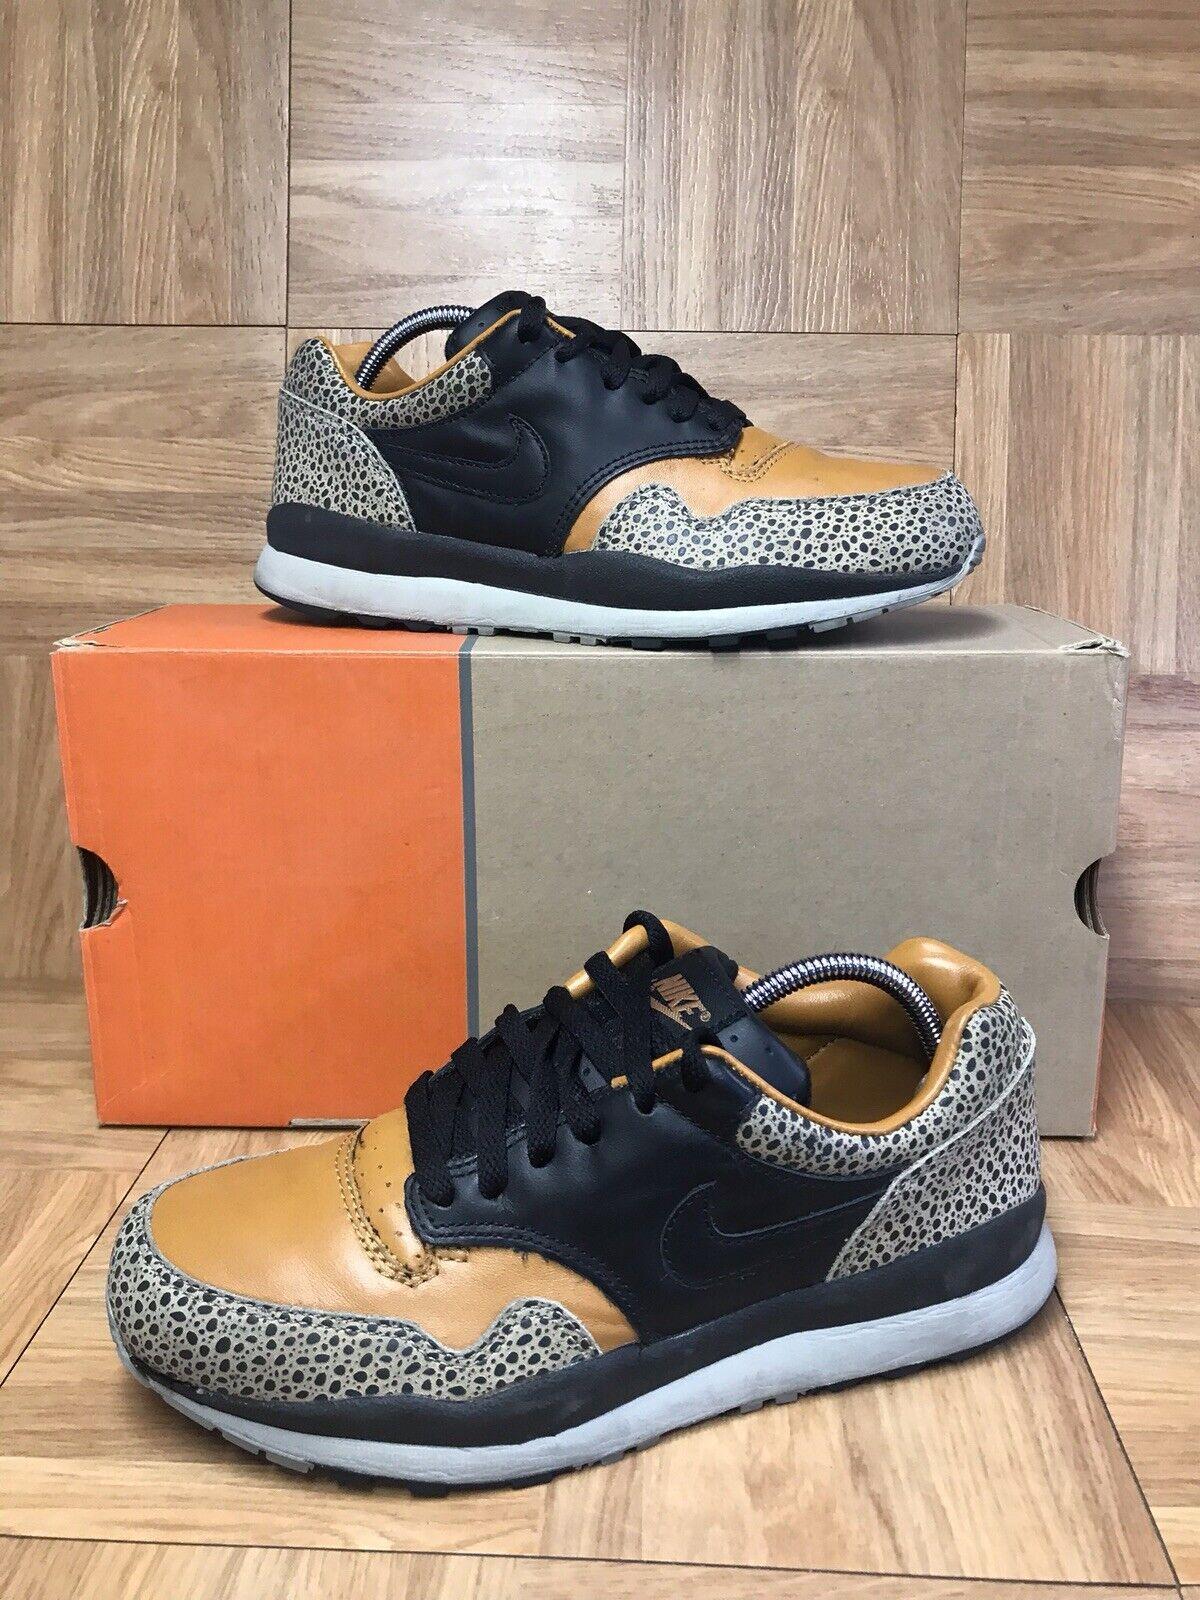 Vintage Nike Air Safari Tan Charcoal Black Sz 7 Men's shoes 306324-201 VNTG